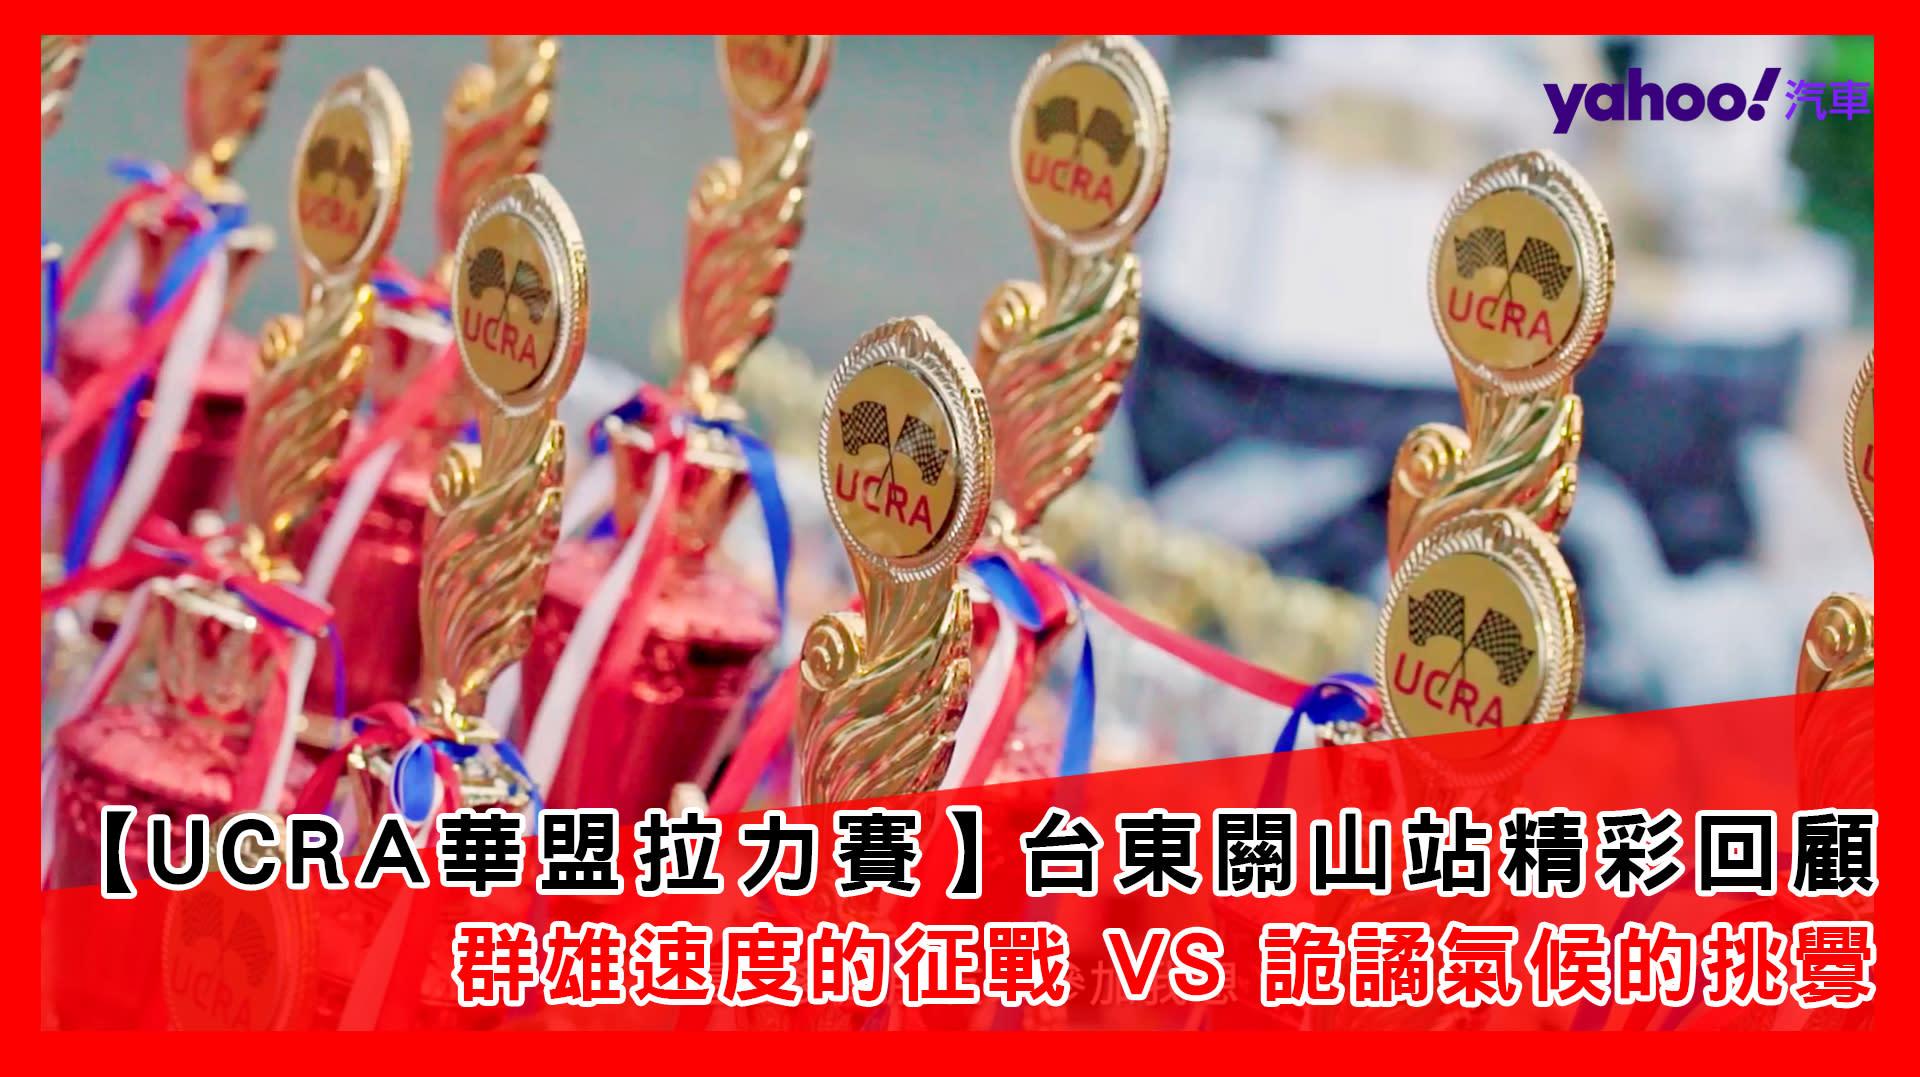 【2020 UCRA華盟拉力賽】台東關山站精彩回顧:挑戰台灣拉力賽最高速賽道!